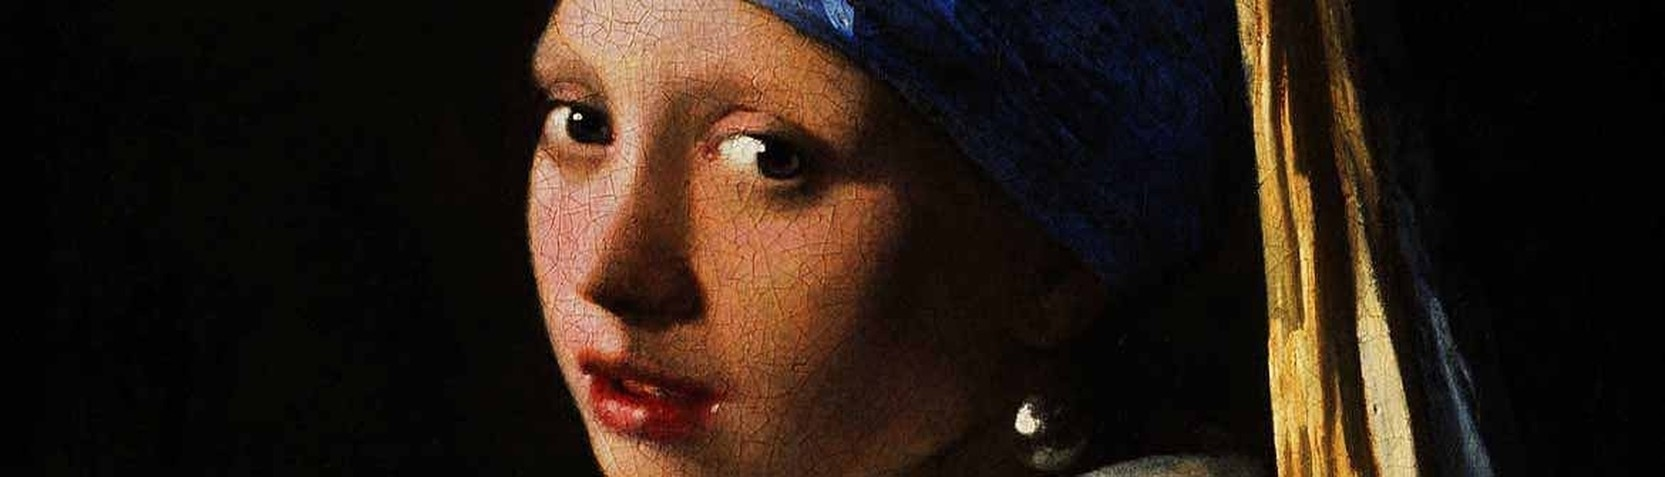 Künstler A-Z - Jan Vermeer